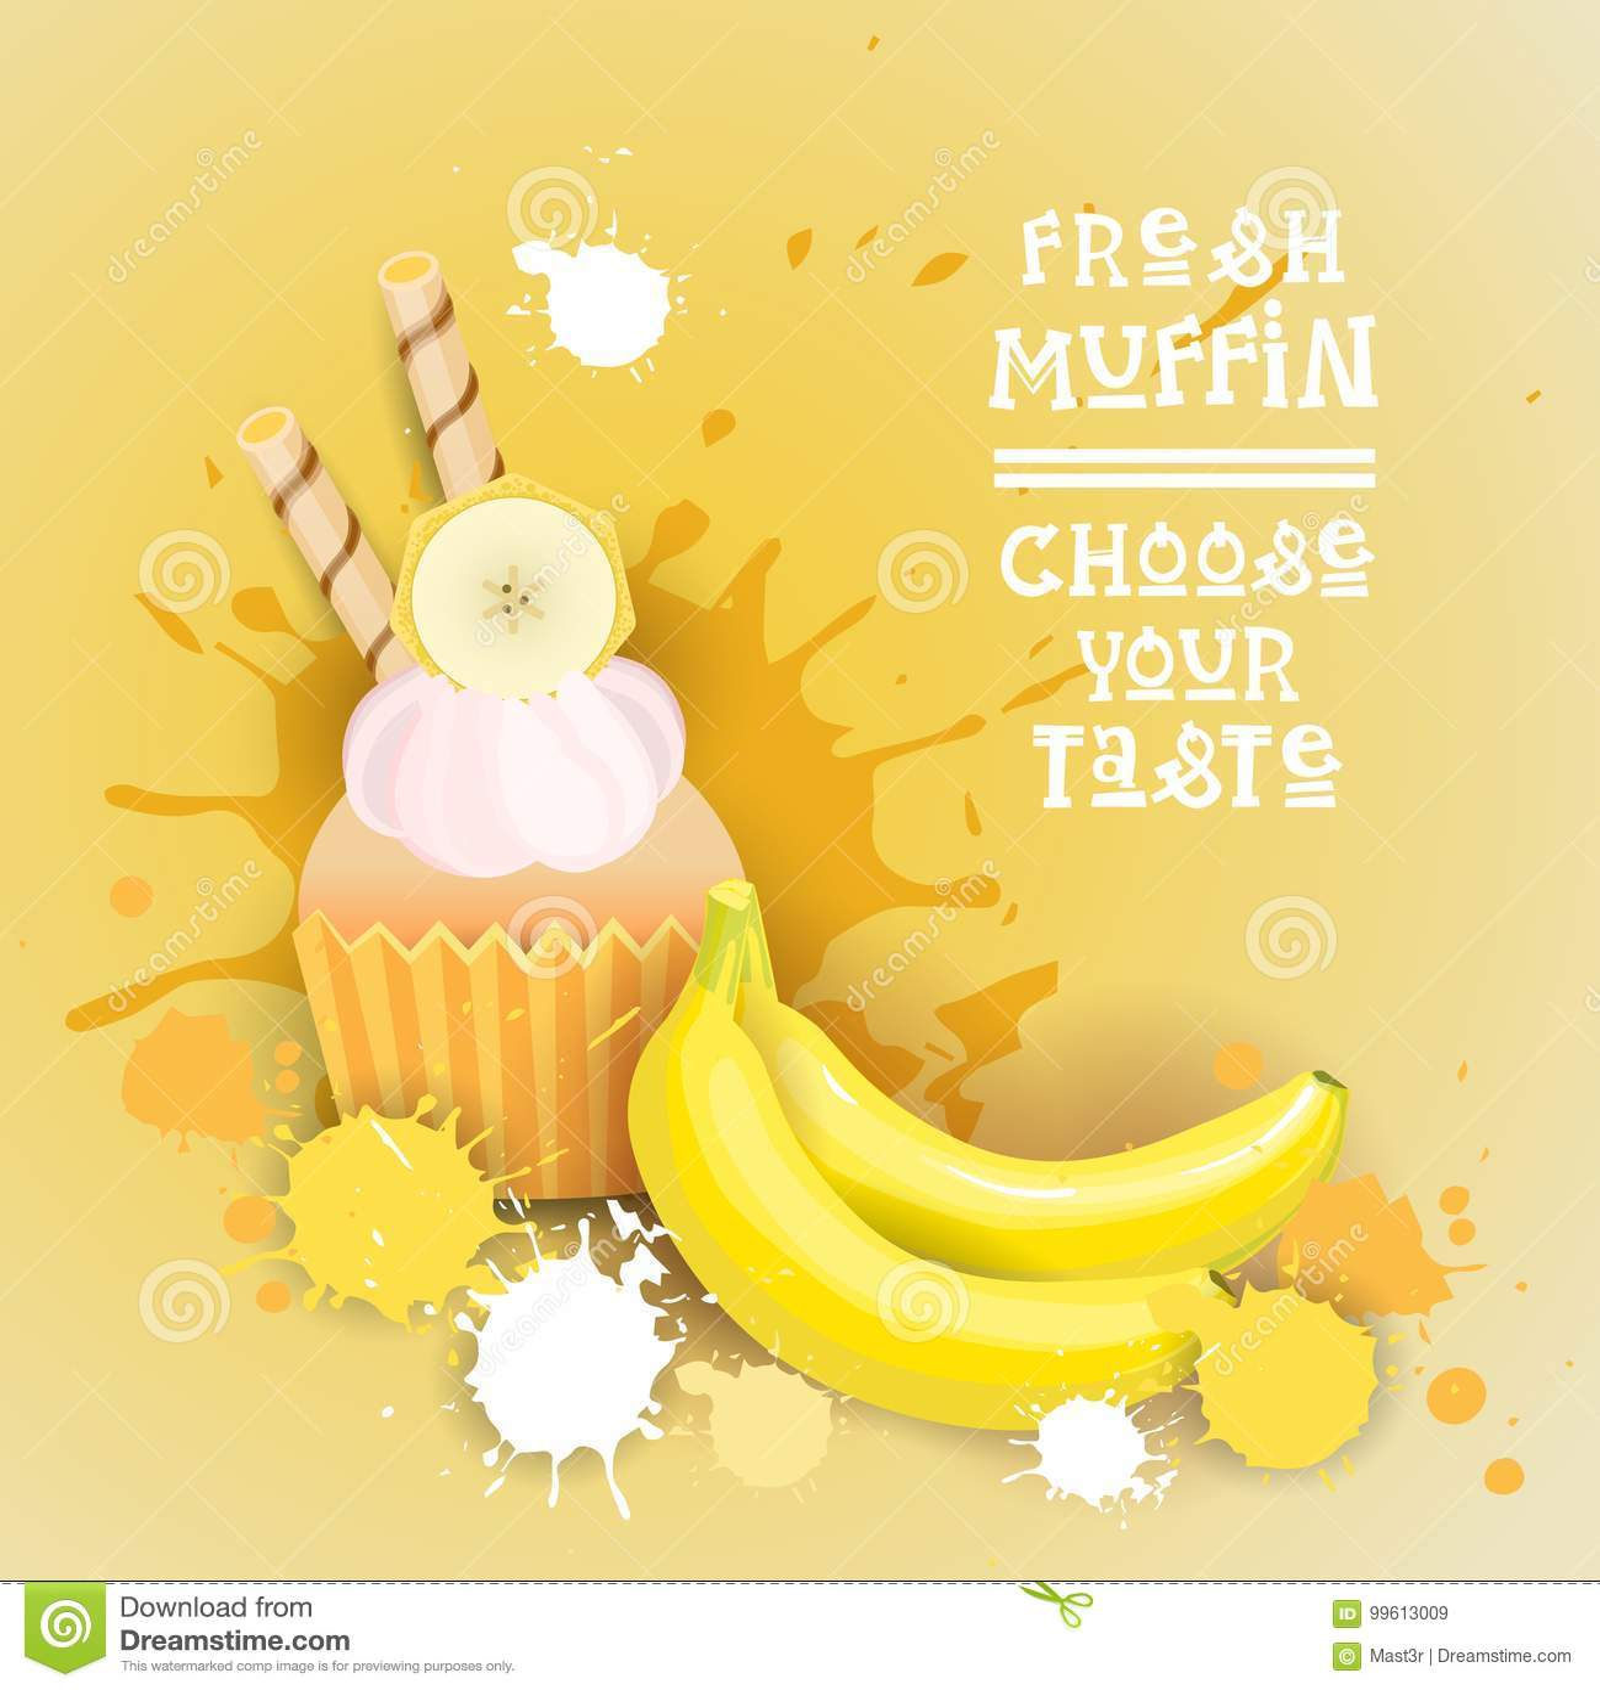 Fresh Muffin Choose Your Taste Logo Cake Sweet Beautiful Cupcake Dessert Delicious Food